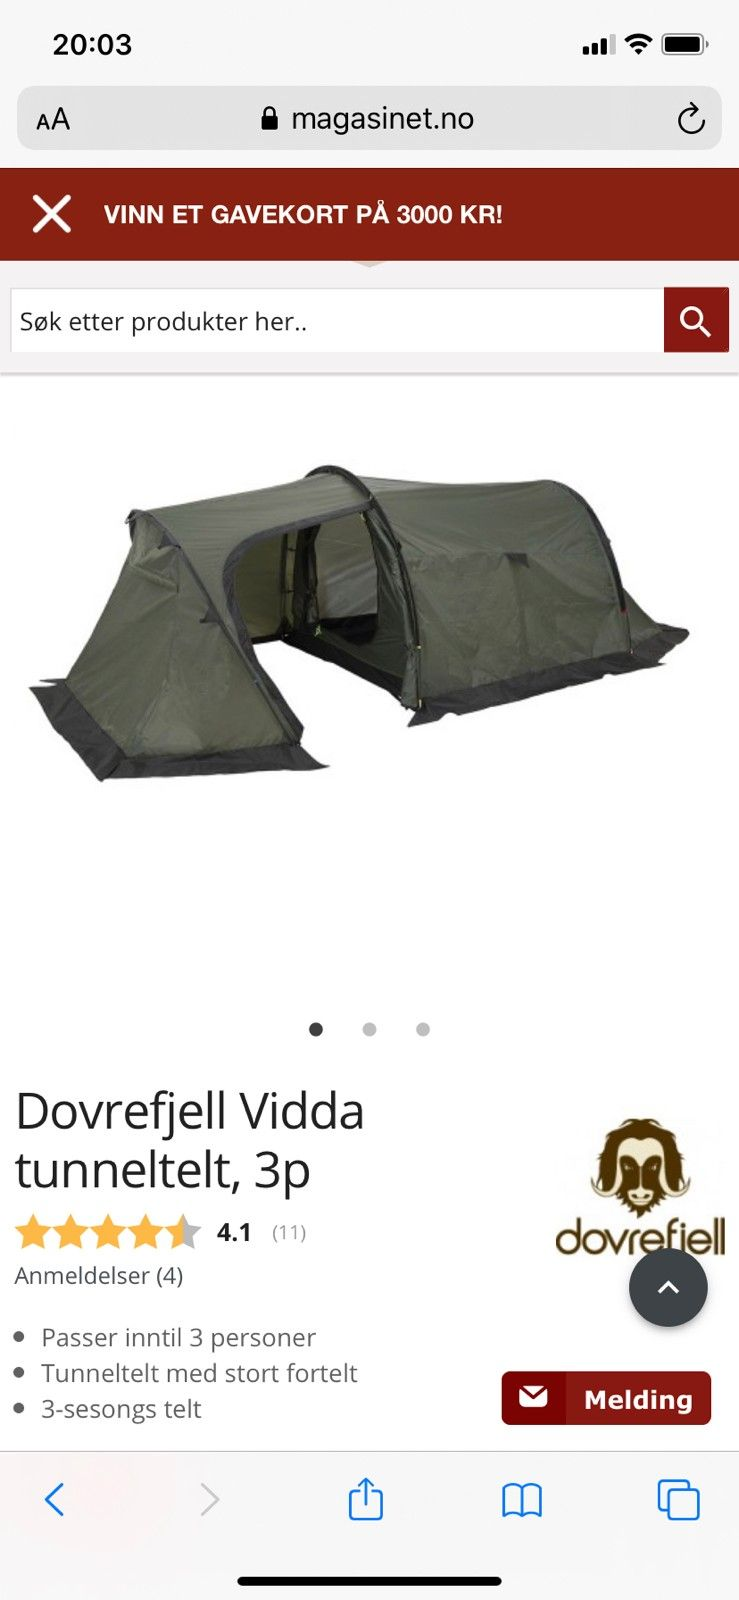 Dovrefjell tunneltelt | FINN.no